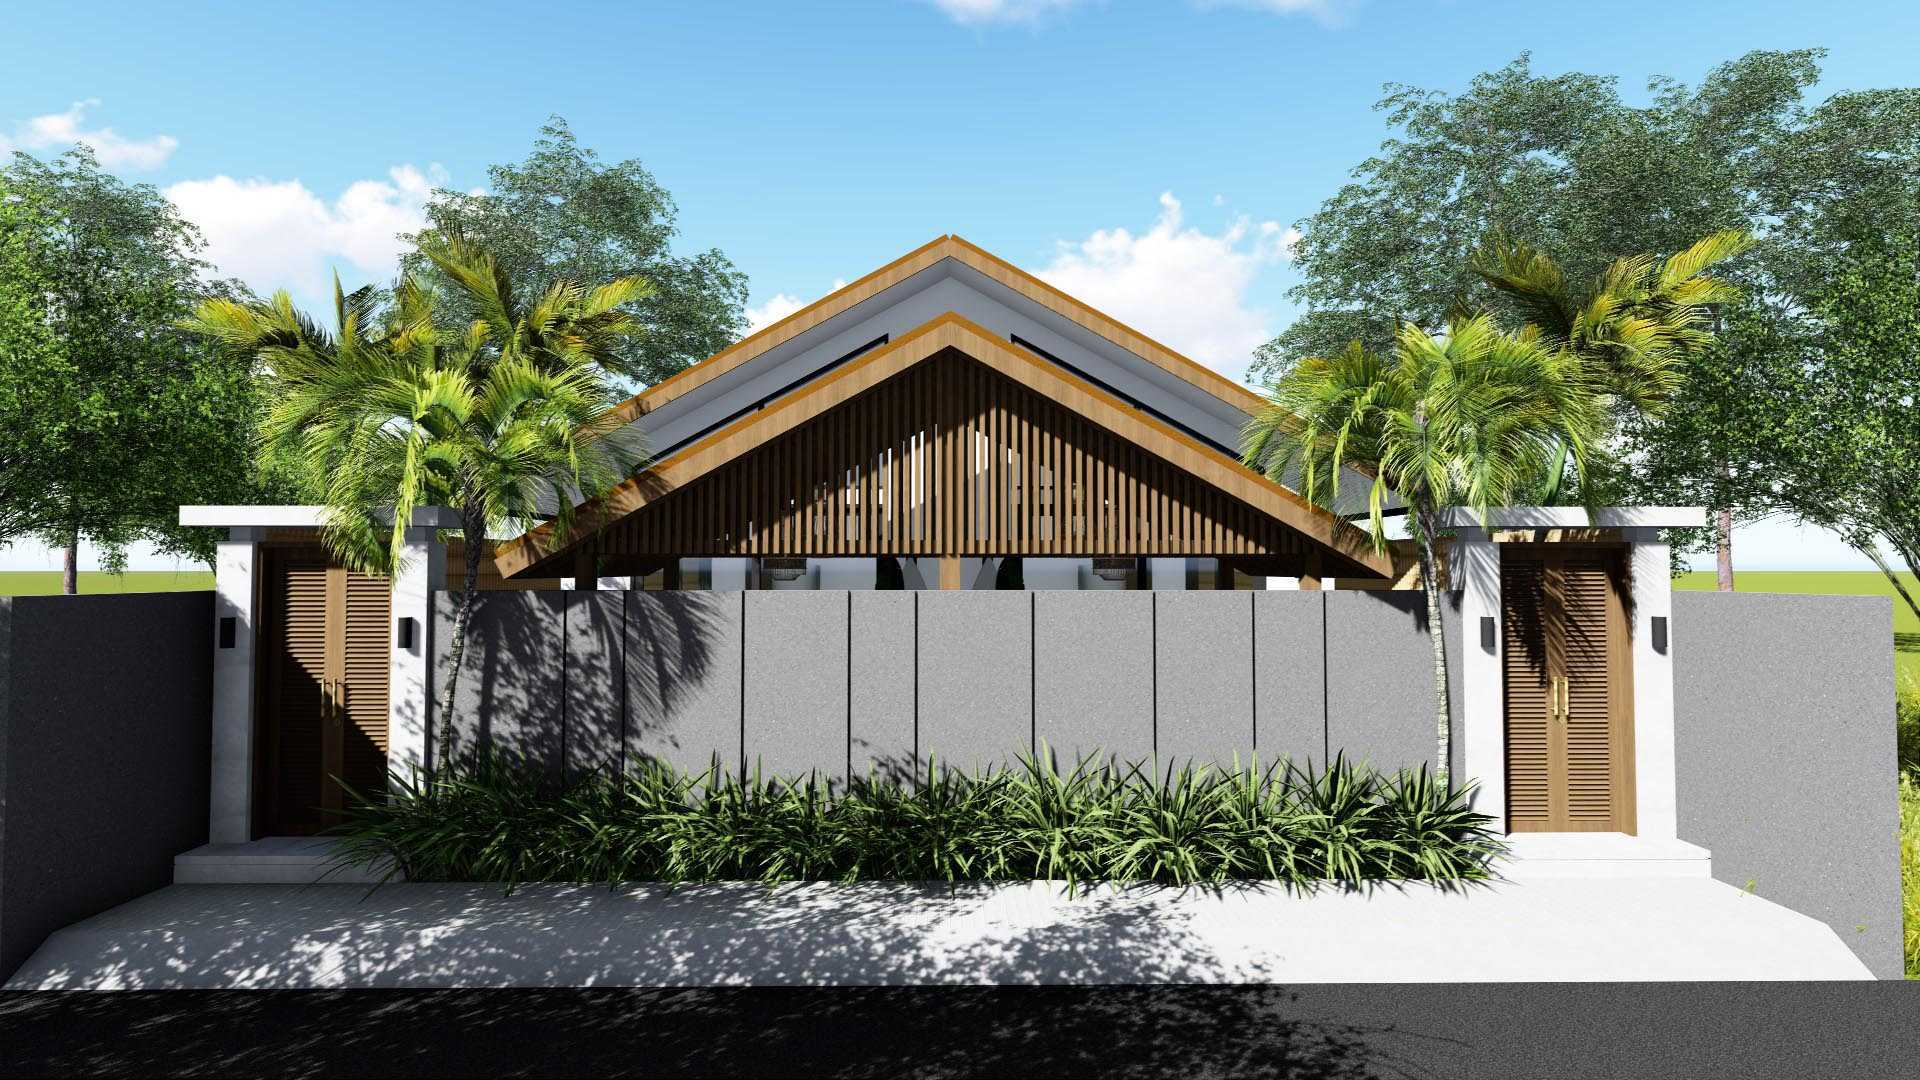 Revan Teggar Md Surf Studio Uluwatu Beach, Pecatu, South Kuta, Badung Regency, Bali 80361, Indonesia Uluwatu Beach, Pecatu, South Kuta, Badung Regency, Bali 80361, Indonesia Revan-Teggar-Md-Surf-Studio   129730